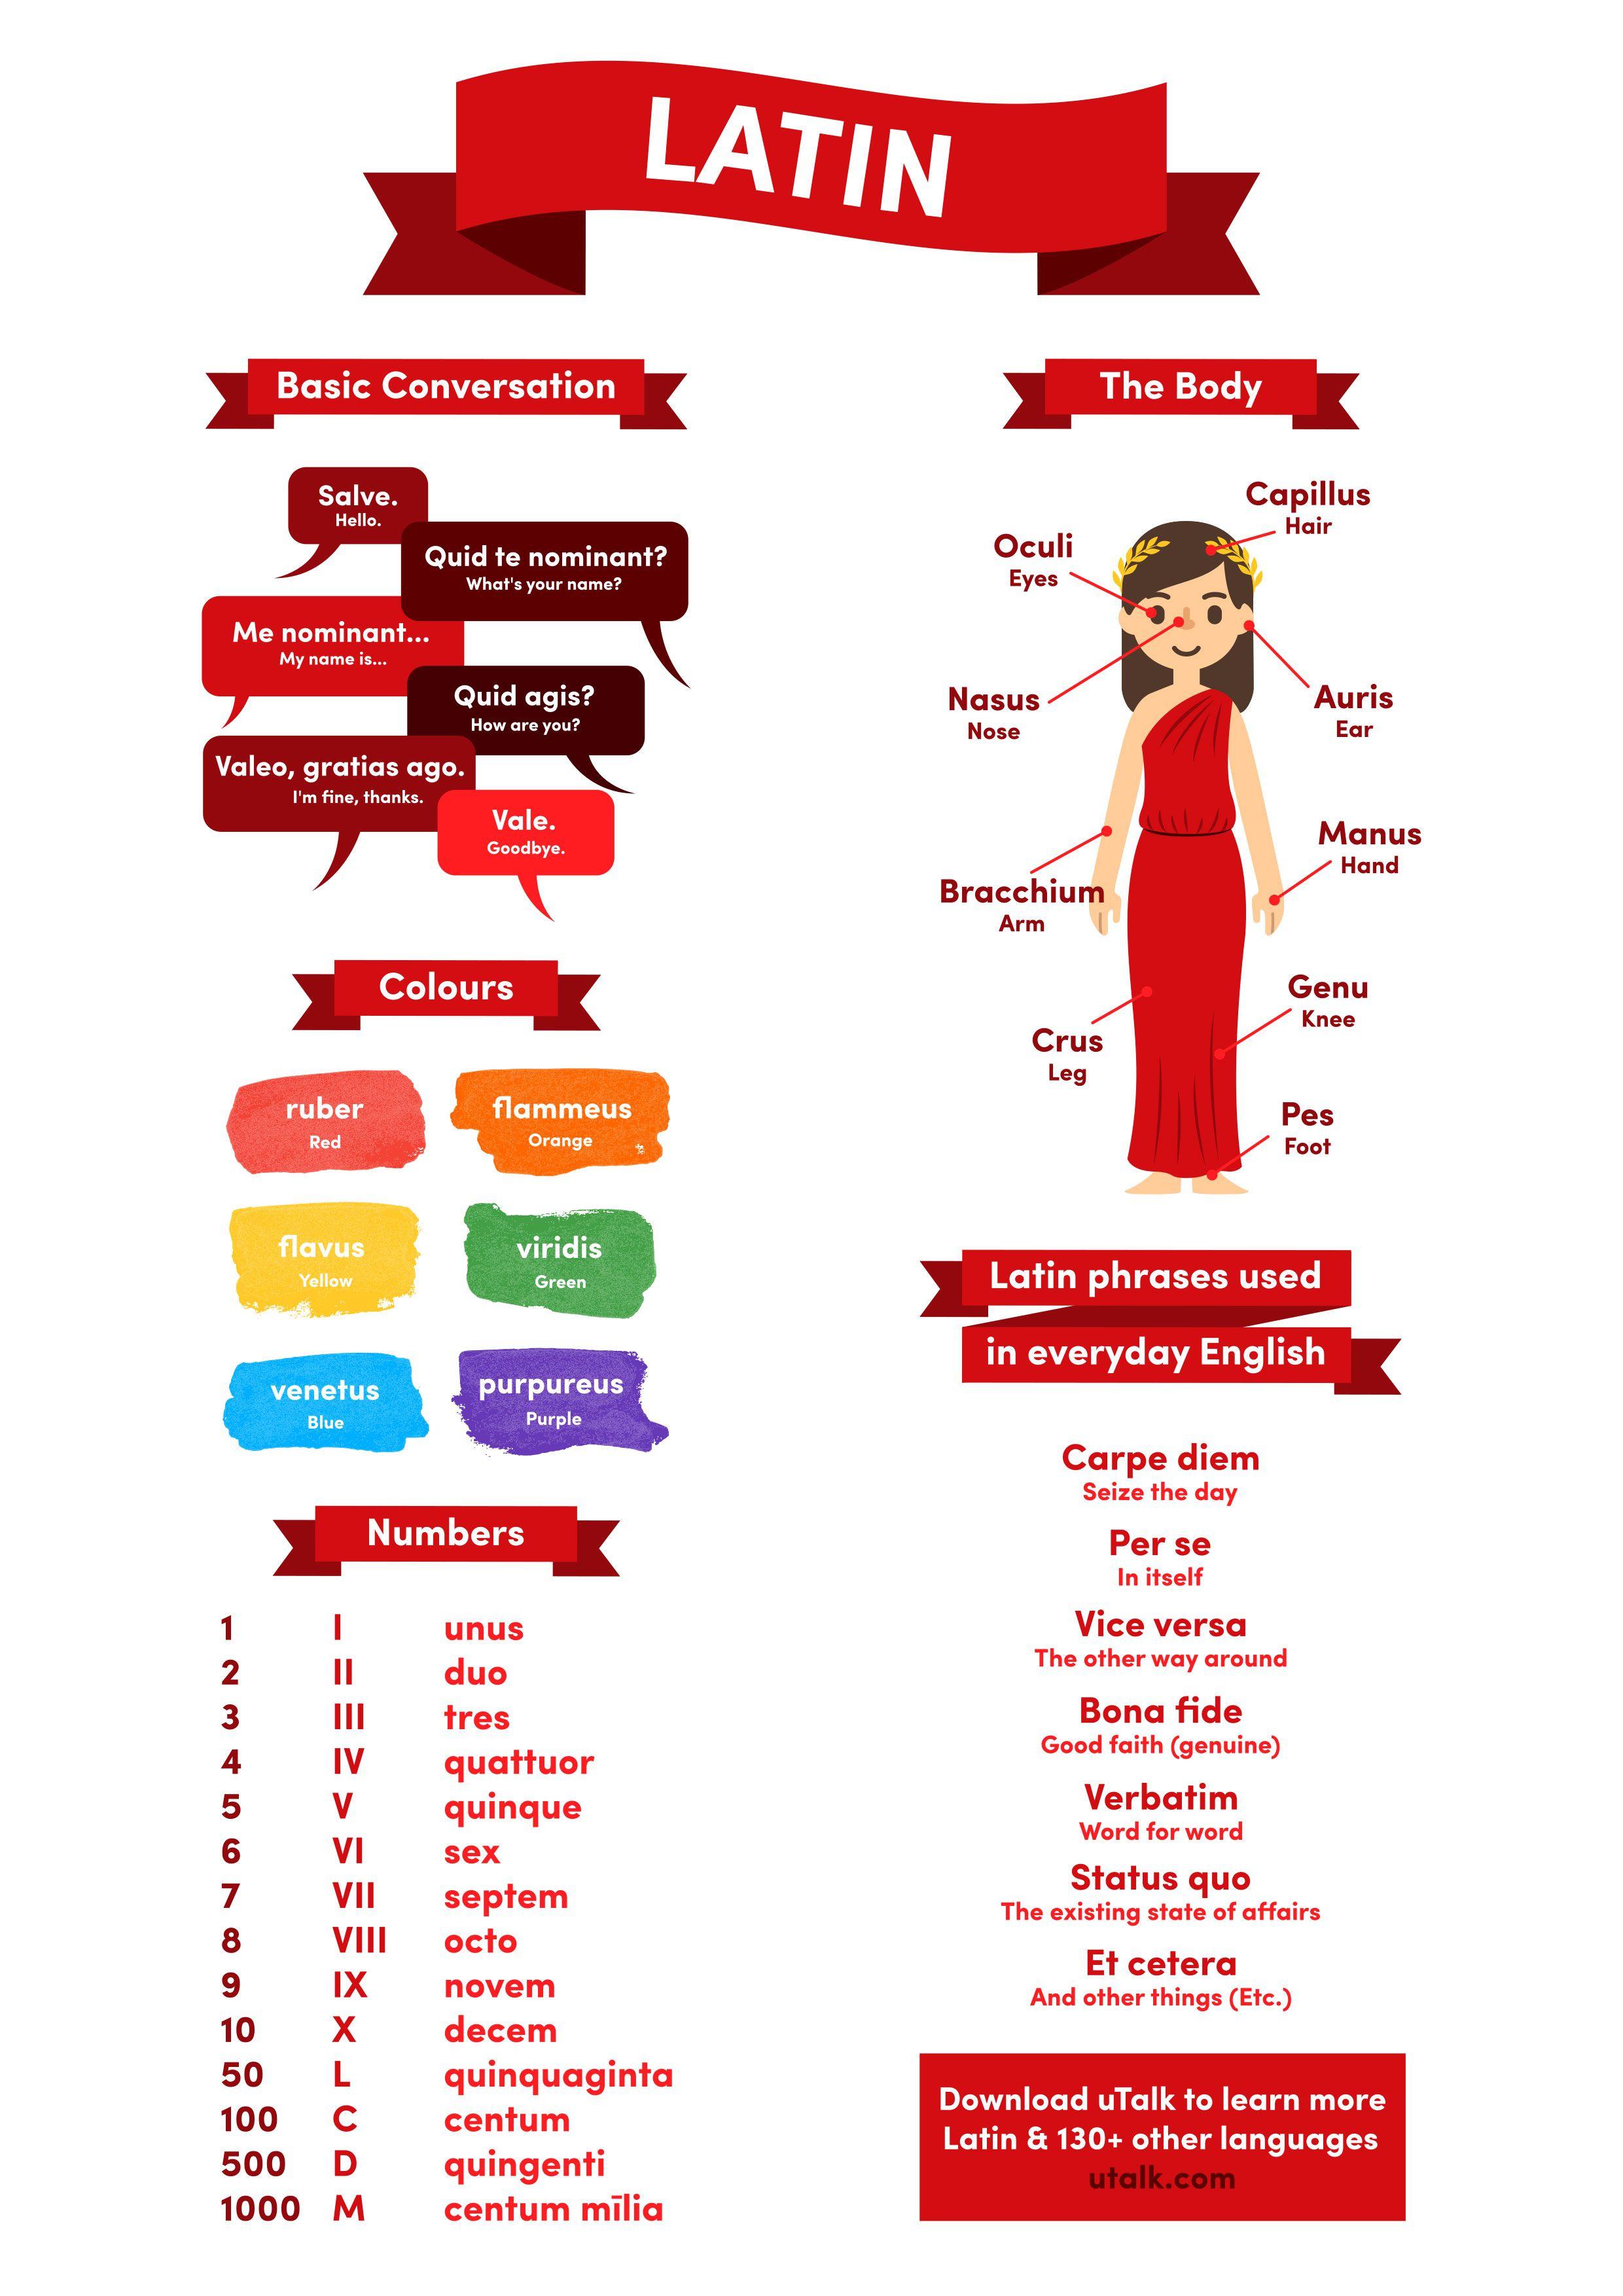 Beginner's guide to Latin